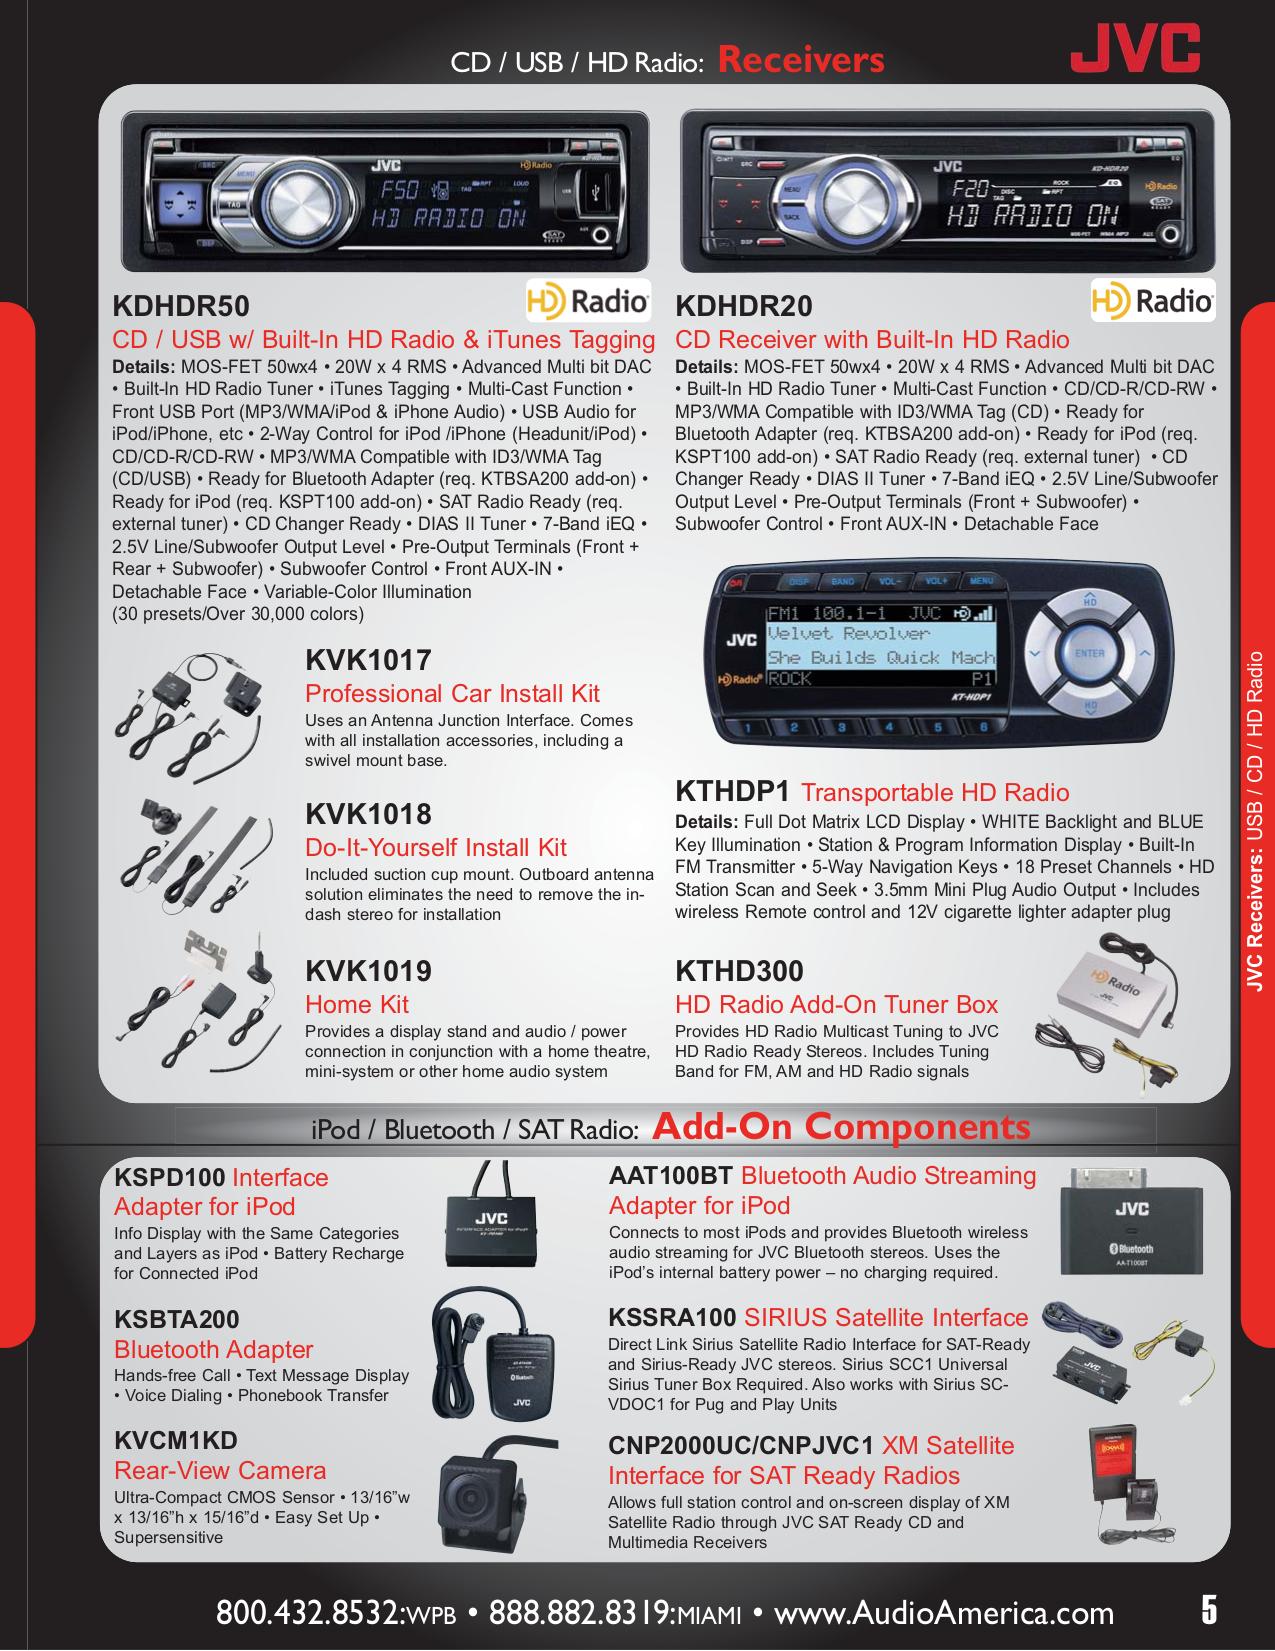 Jvc Car Stereo Manual Kd R200 Wiring Diagram Receiver Pdf Page Preview